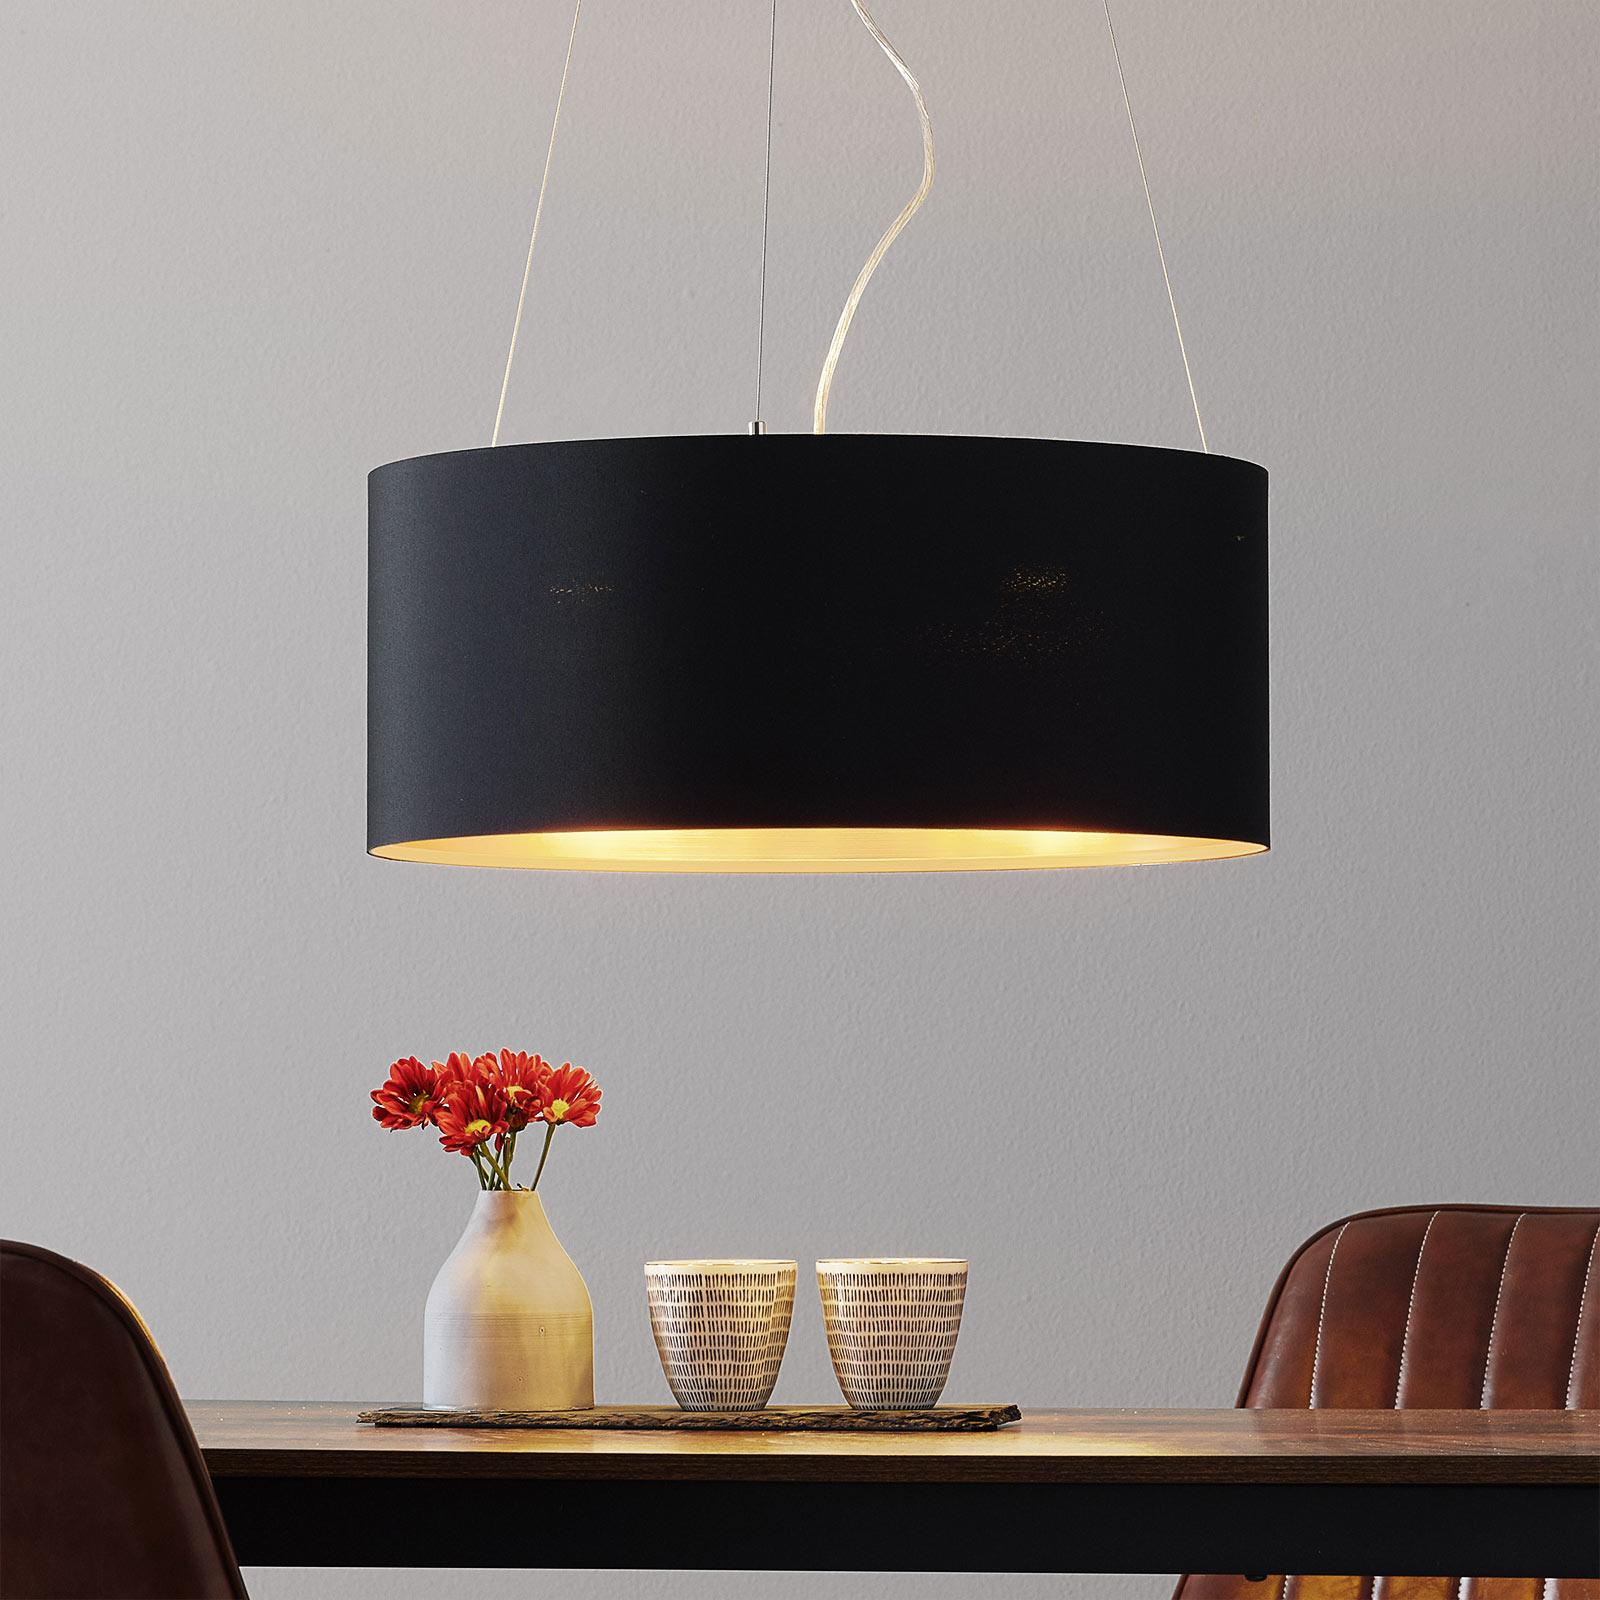 Lecio - svart-gyllene textil-taklampa